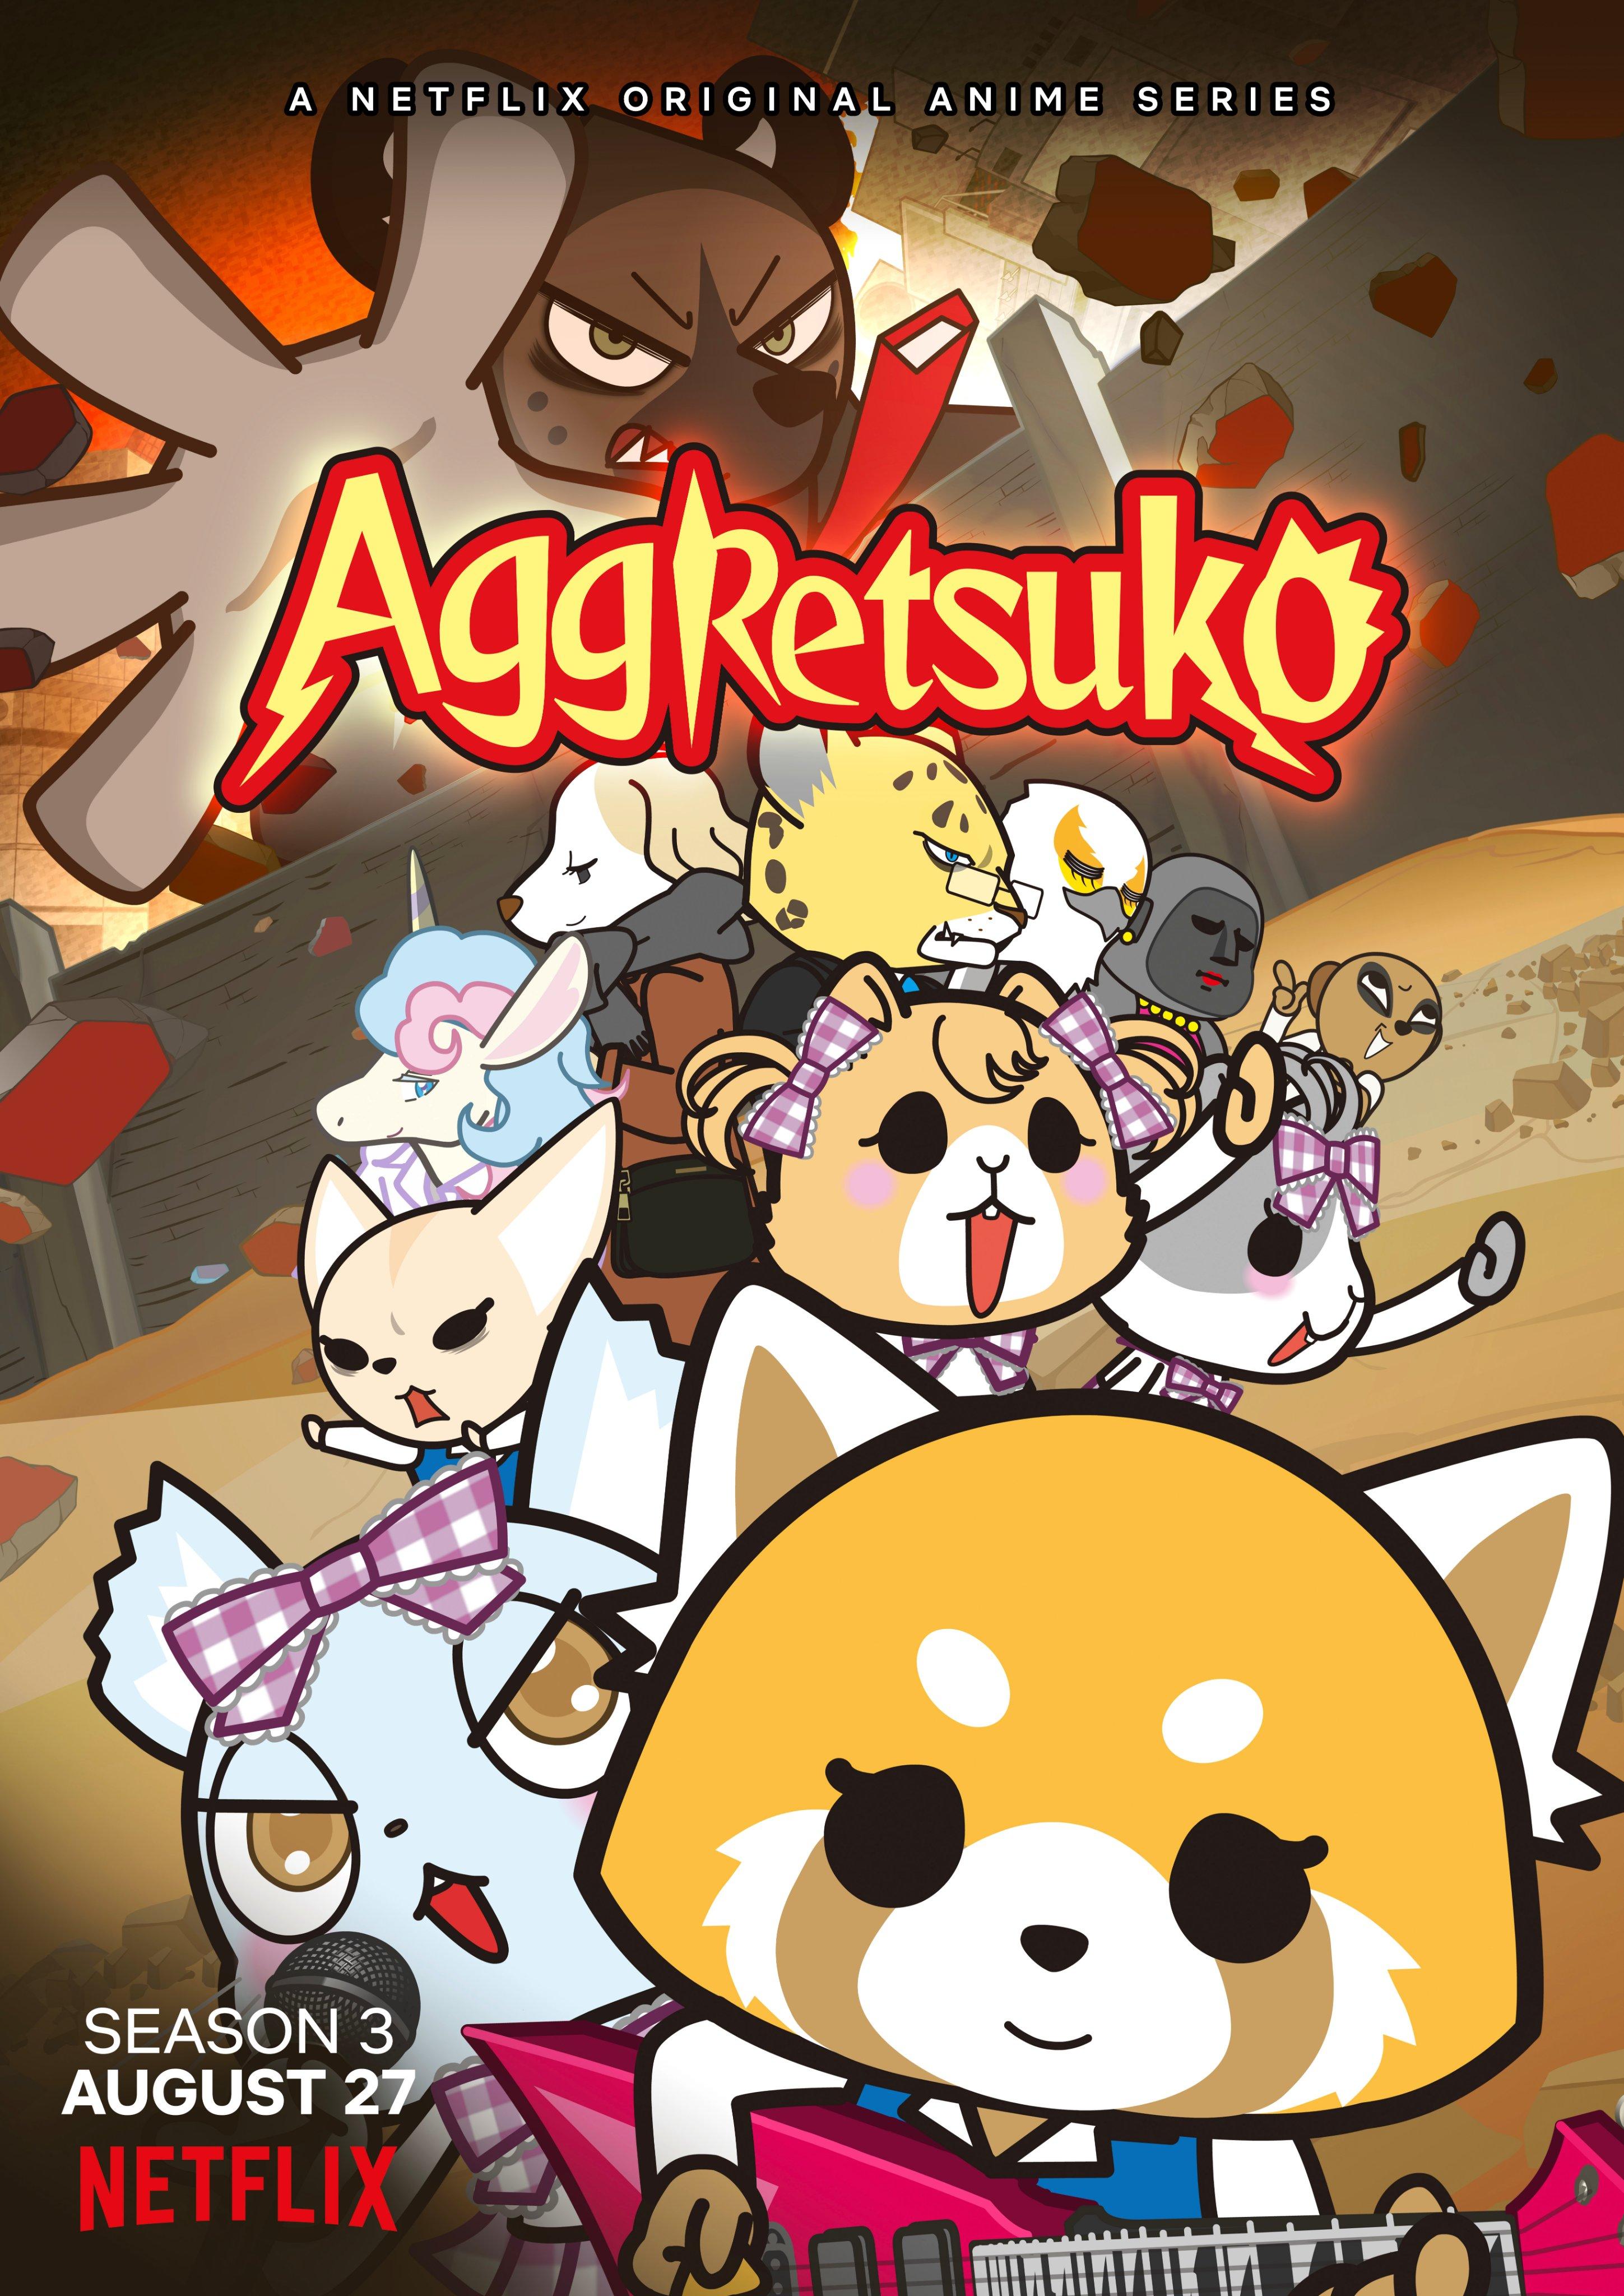 Aggretsuko S3 Affiche